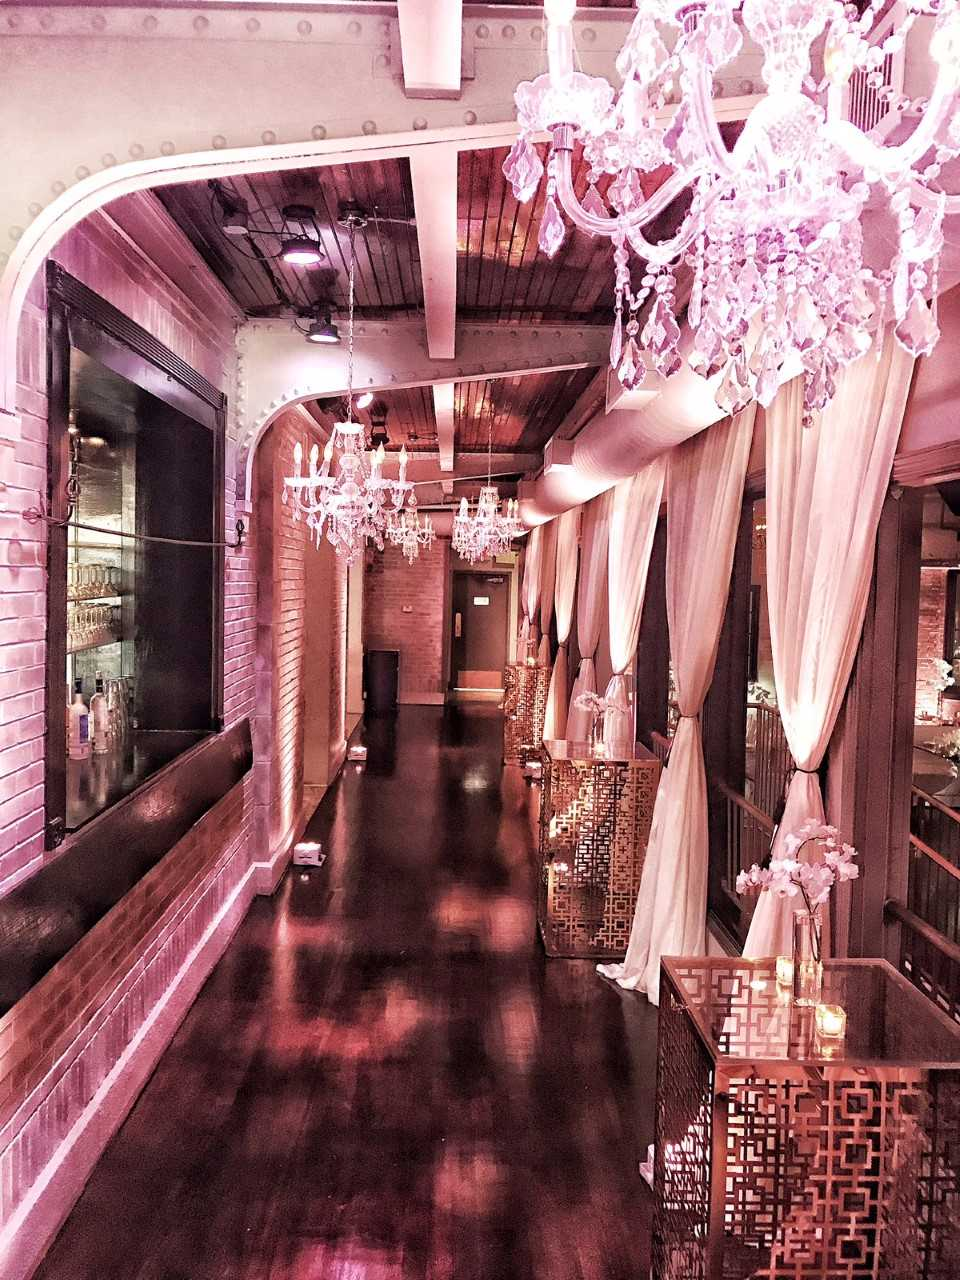 Beat Street Station Wedding Venue in Philadelphia | PartySpace